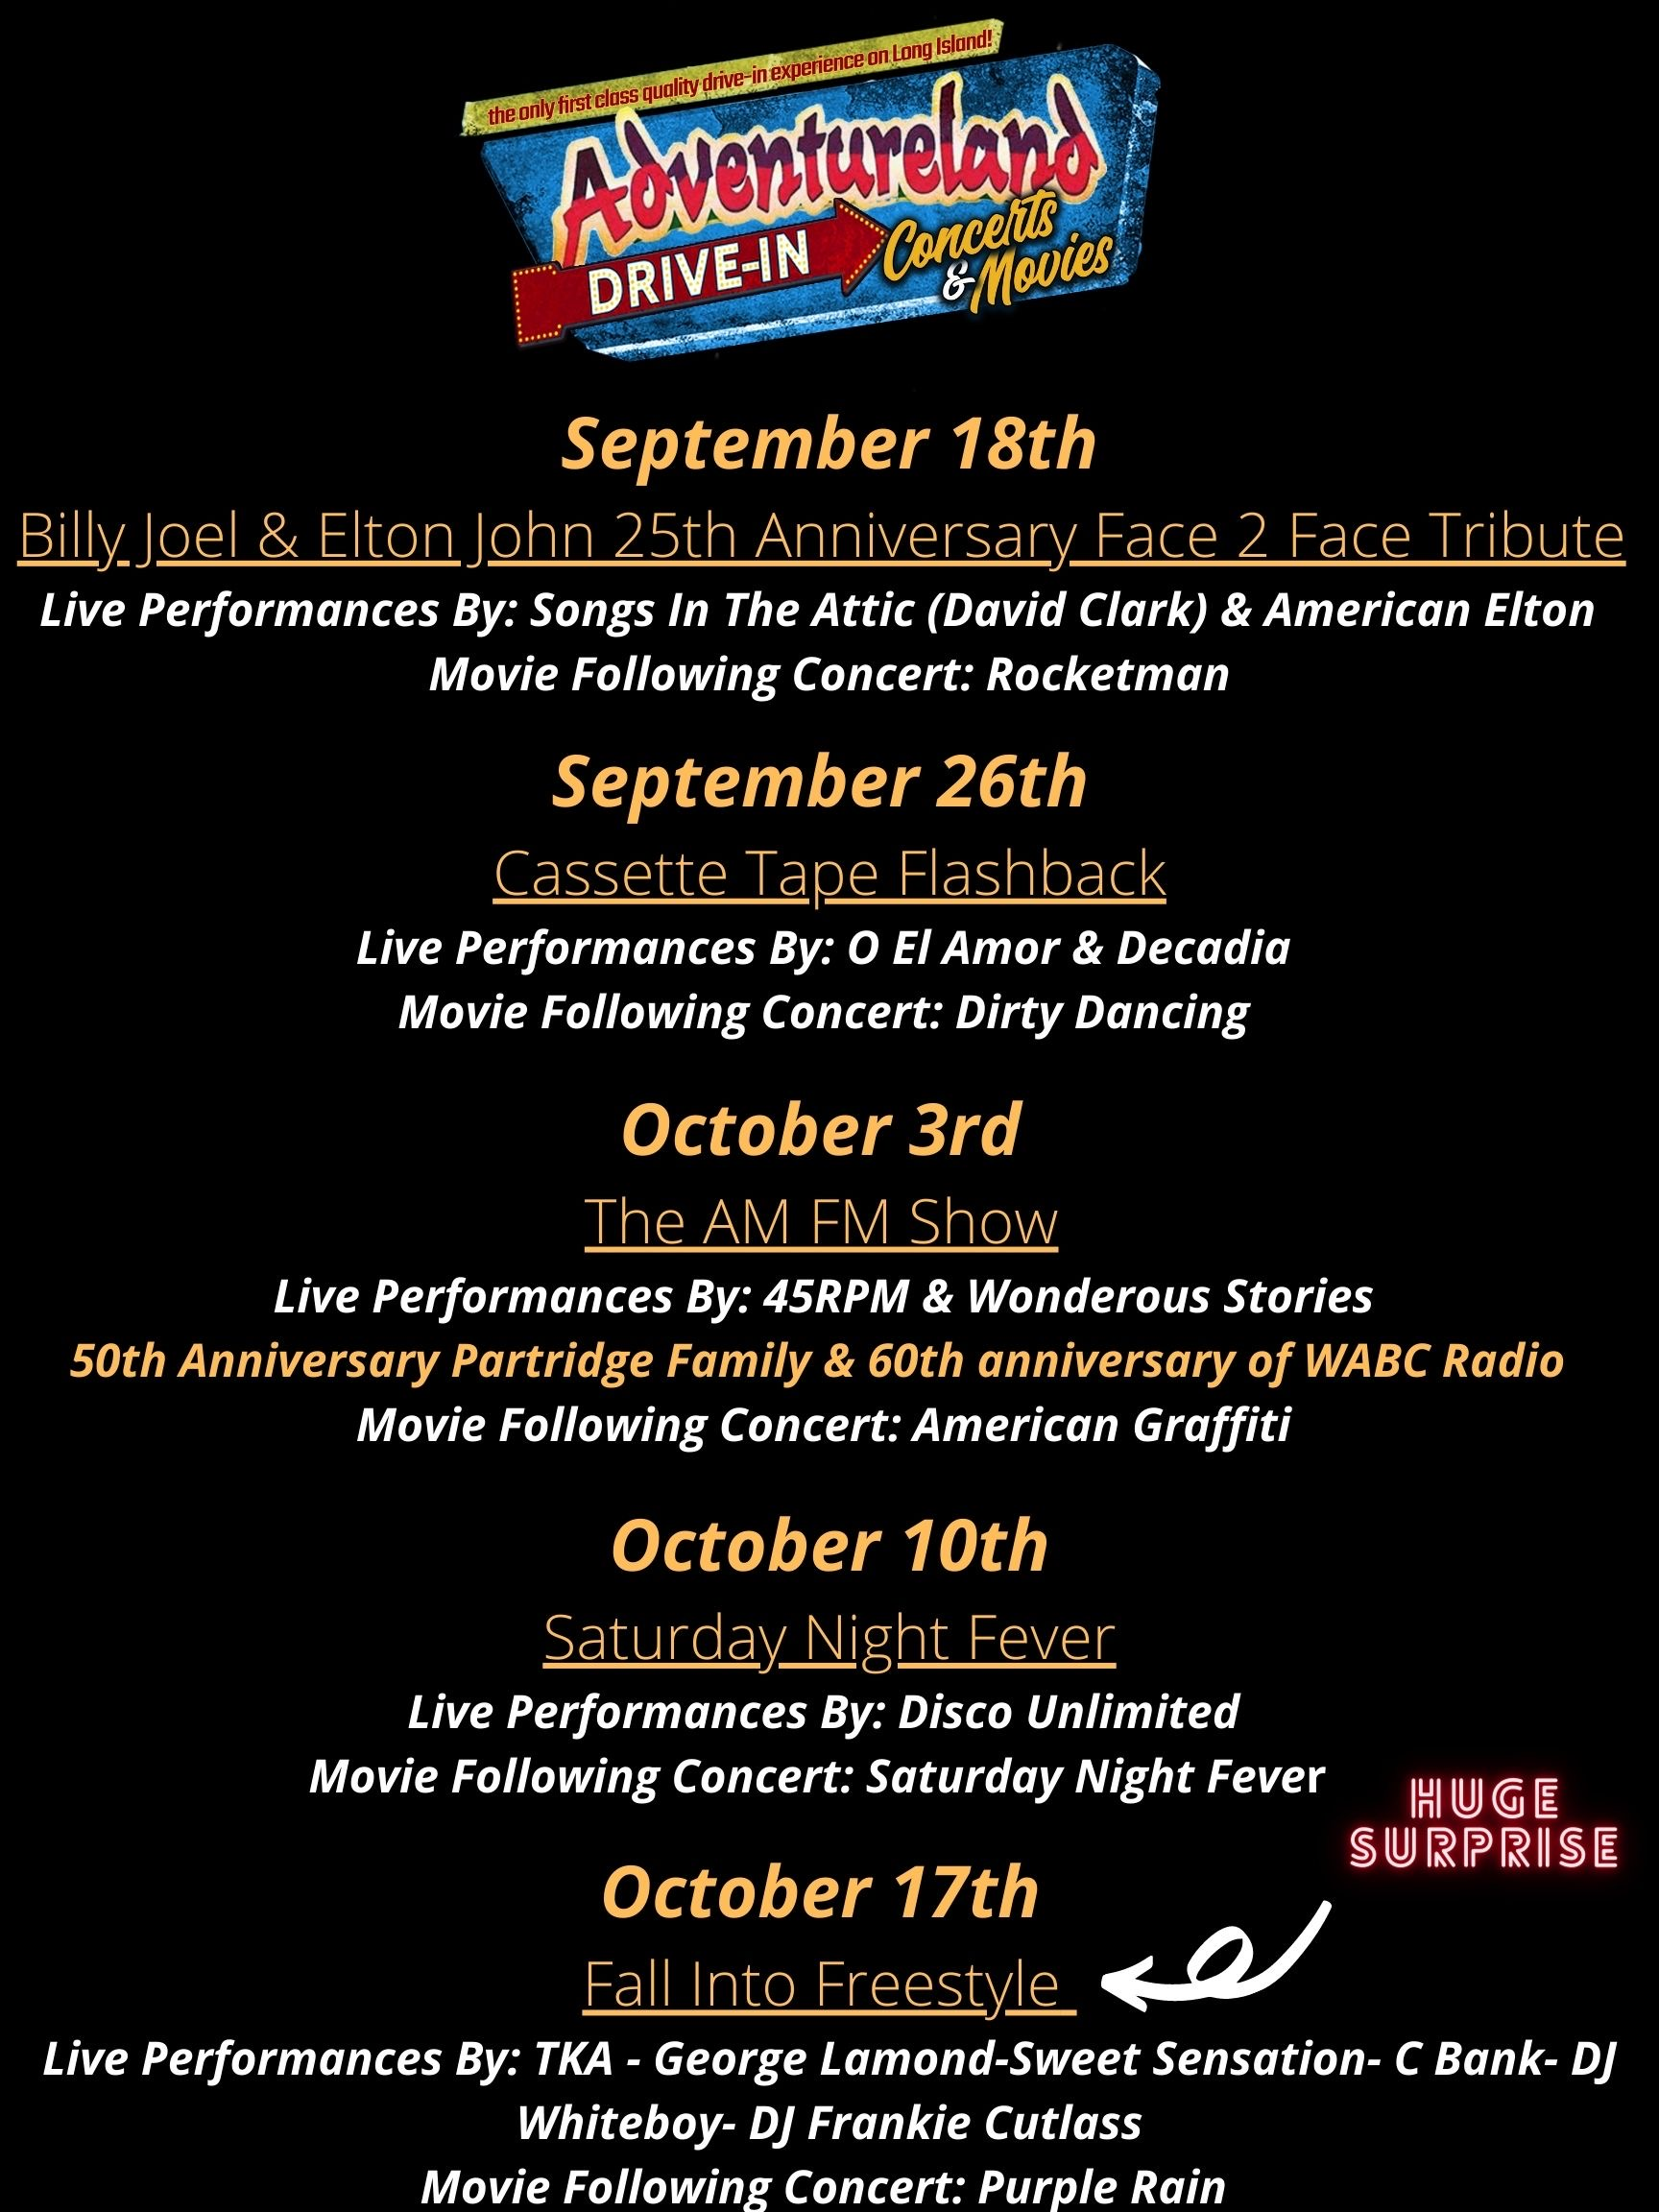 Adventureland Drive In Concerts & Movies